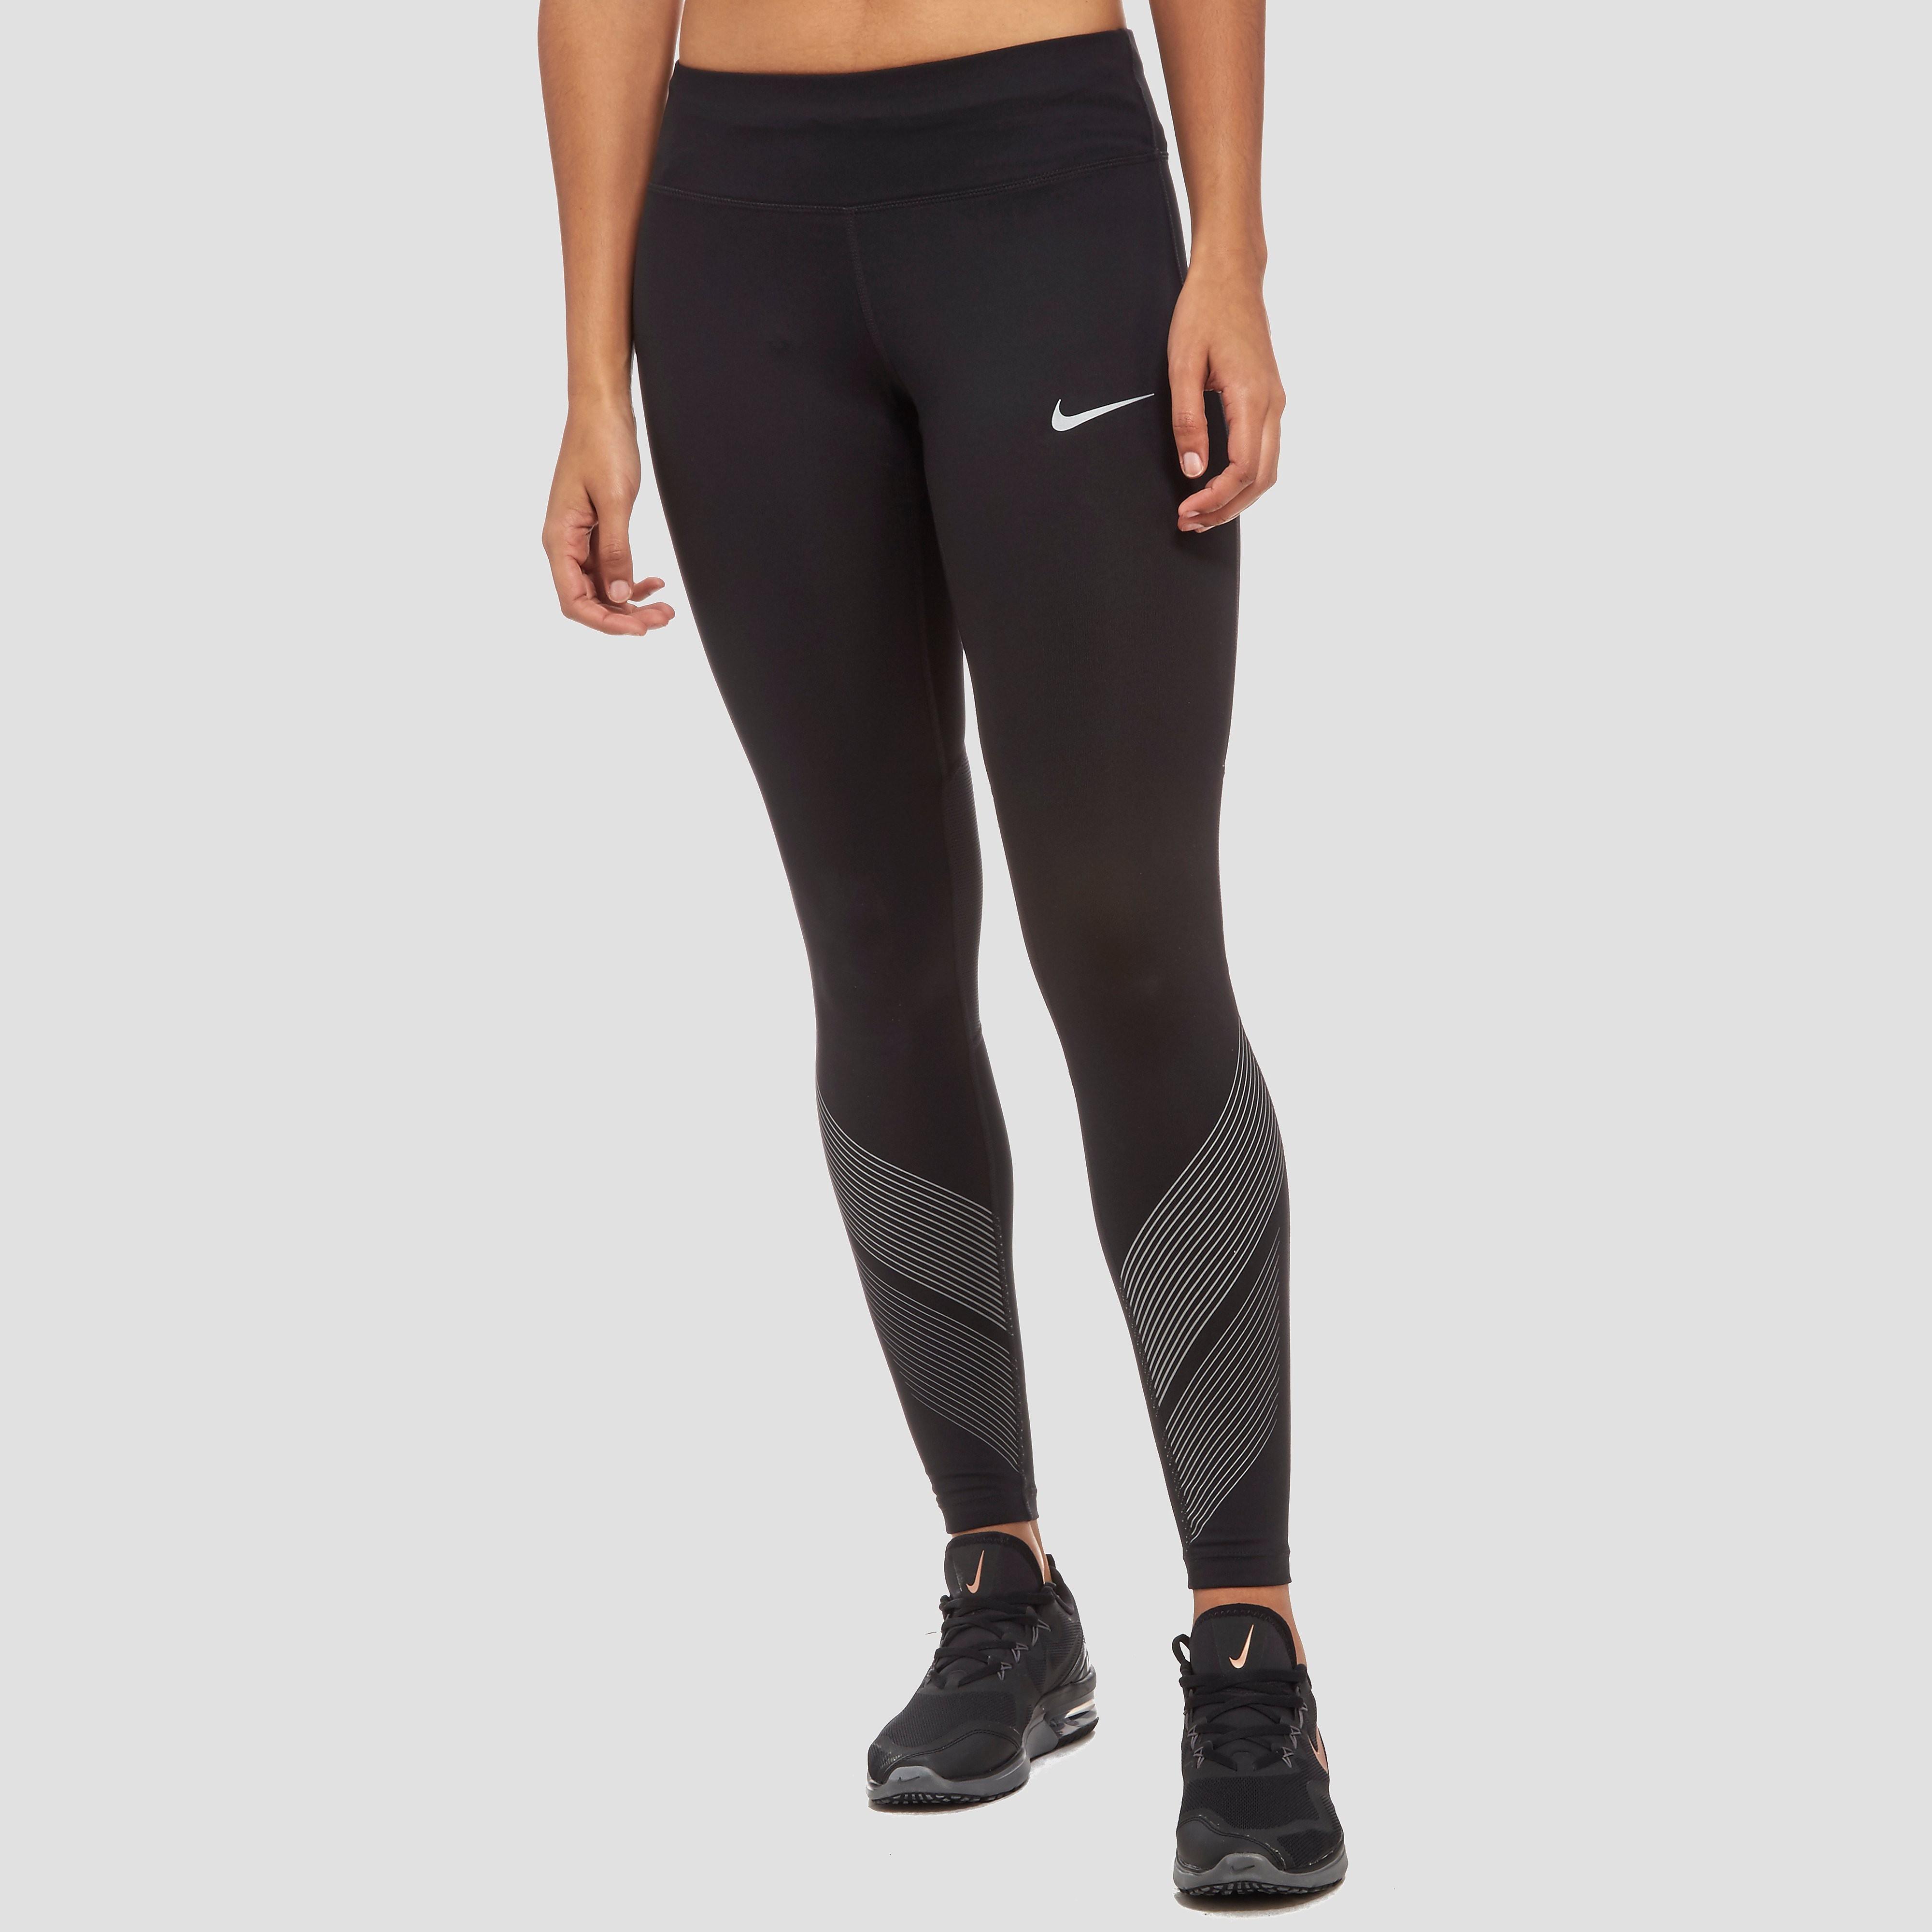 Nike Flash Racer Women's Running Tights